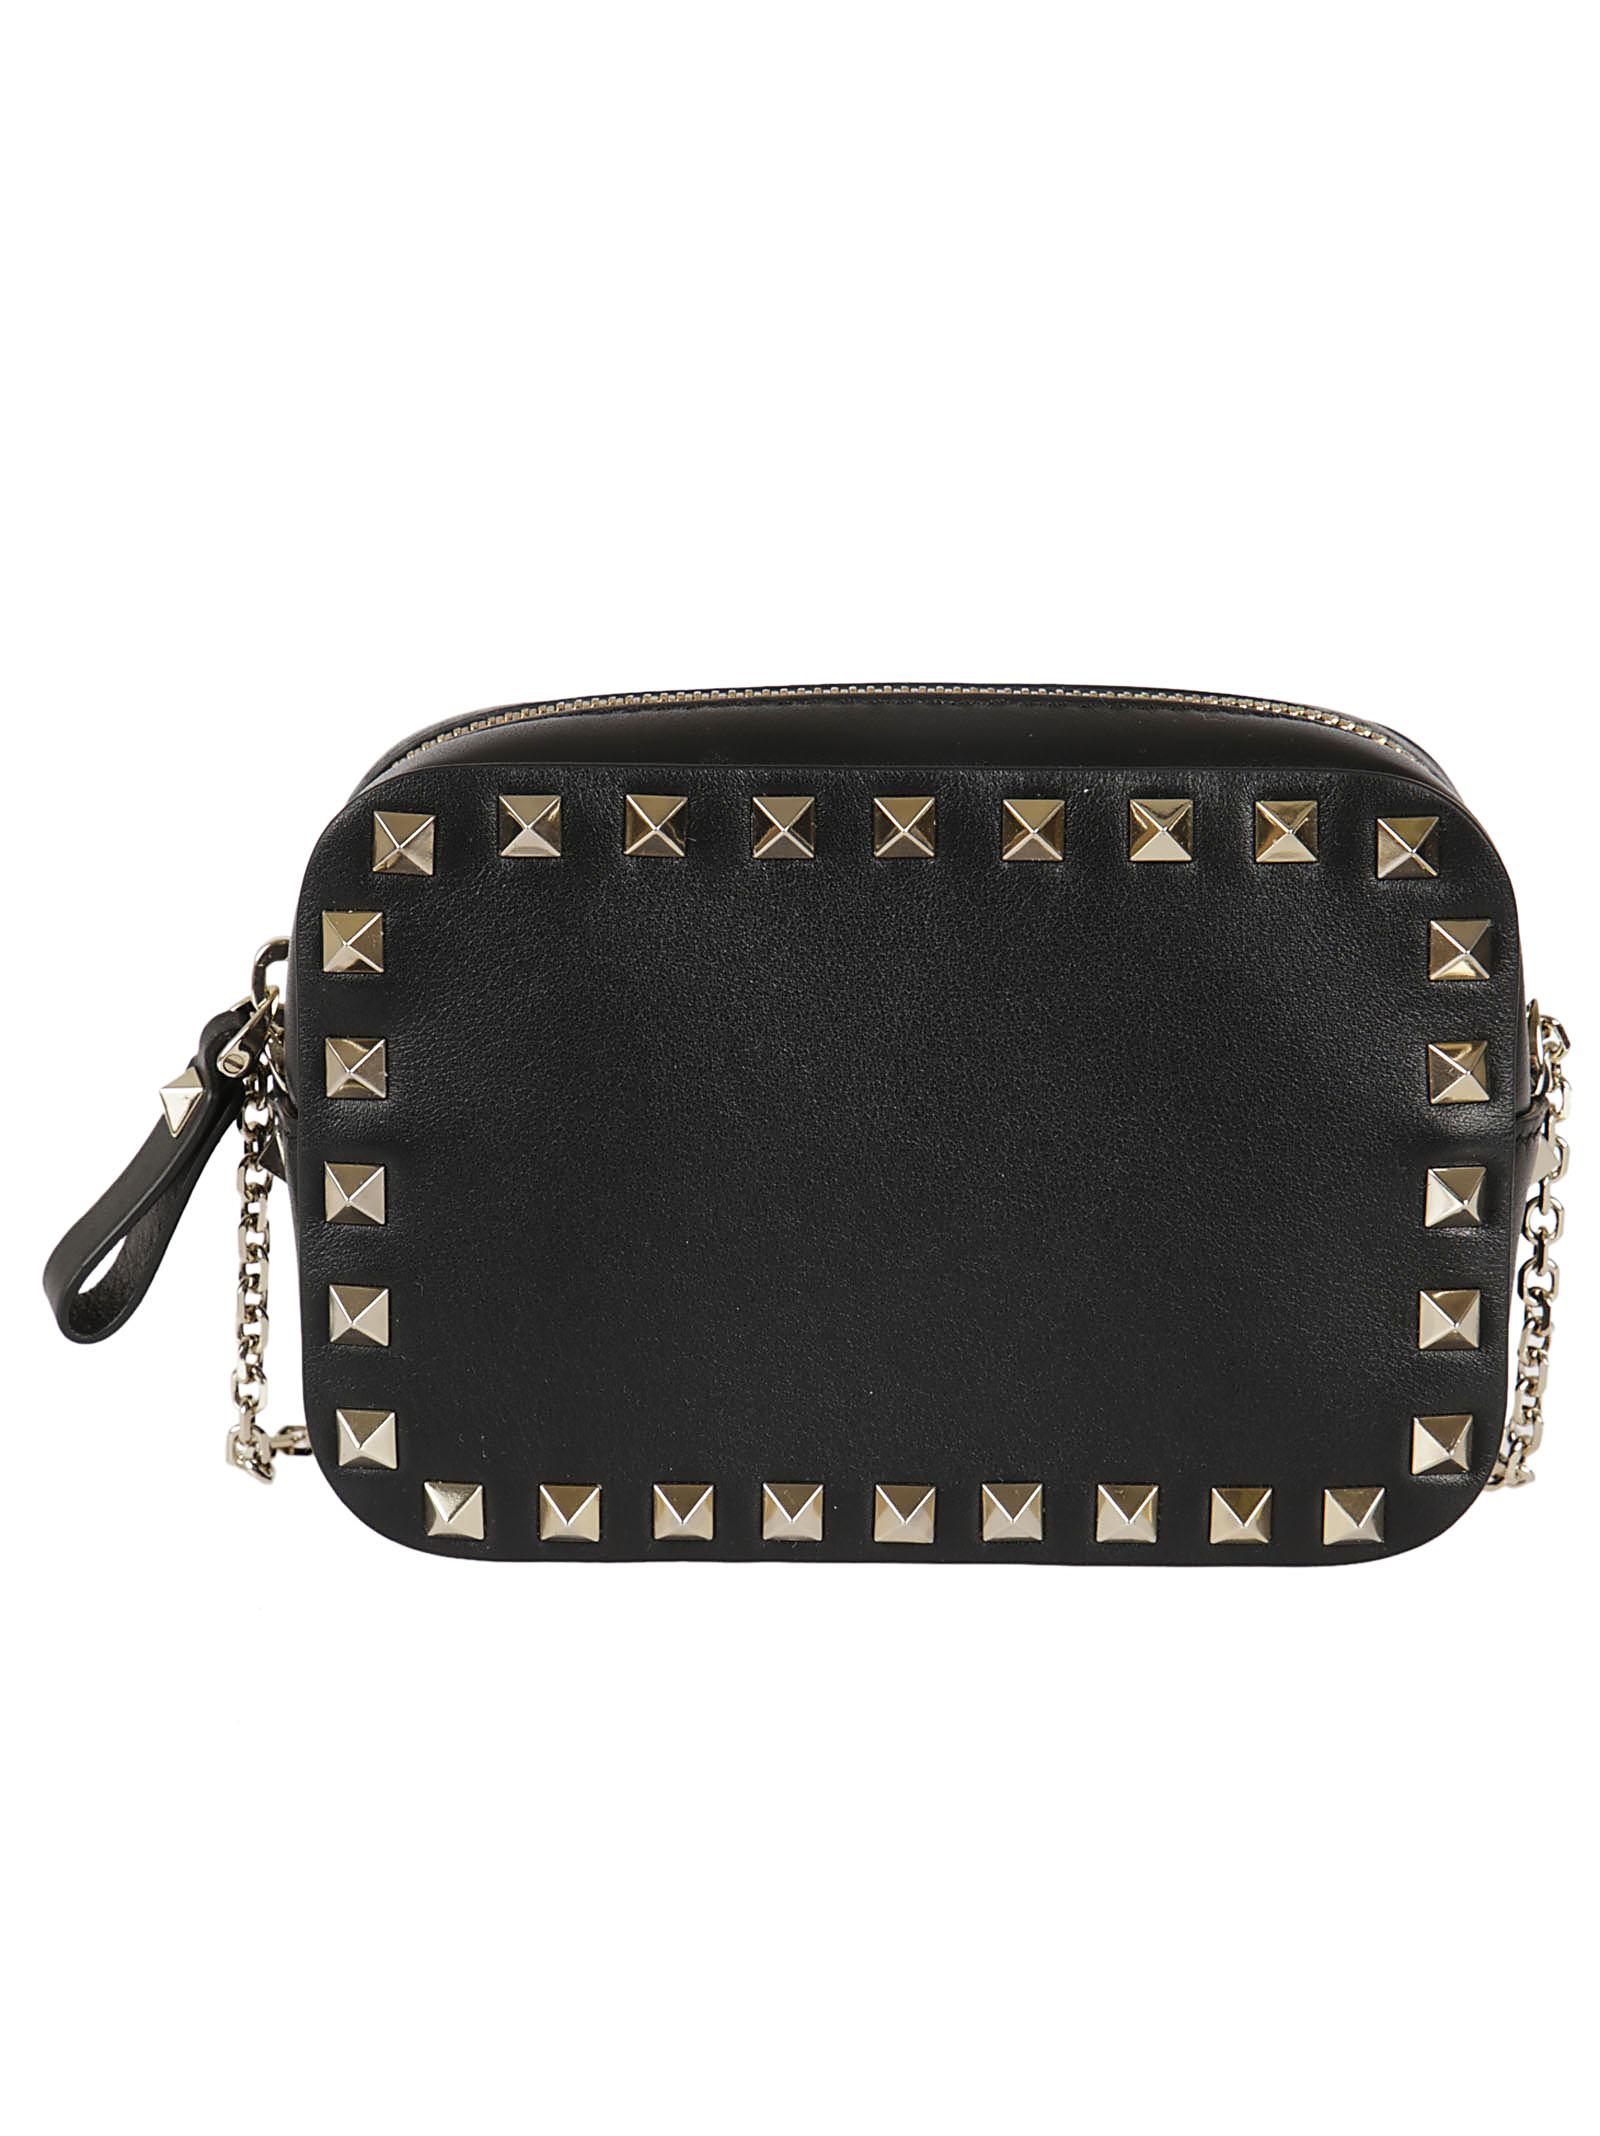 Valentino Garavani Valentino Garavani Rockstud Shoulder Bag